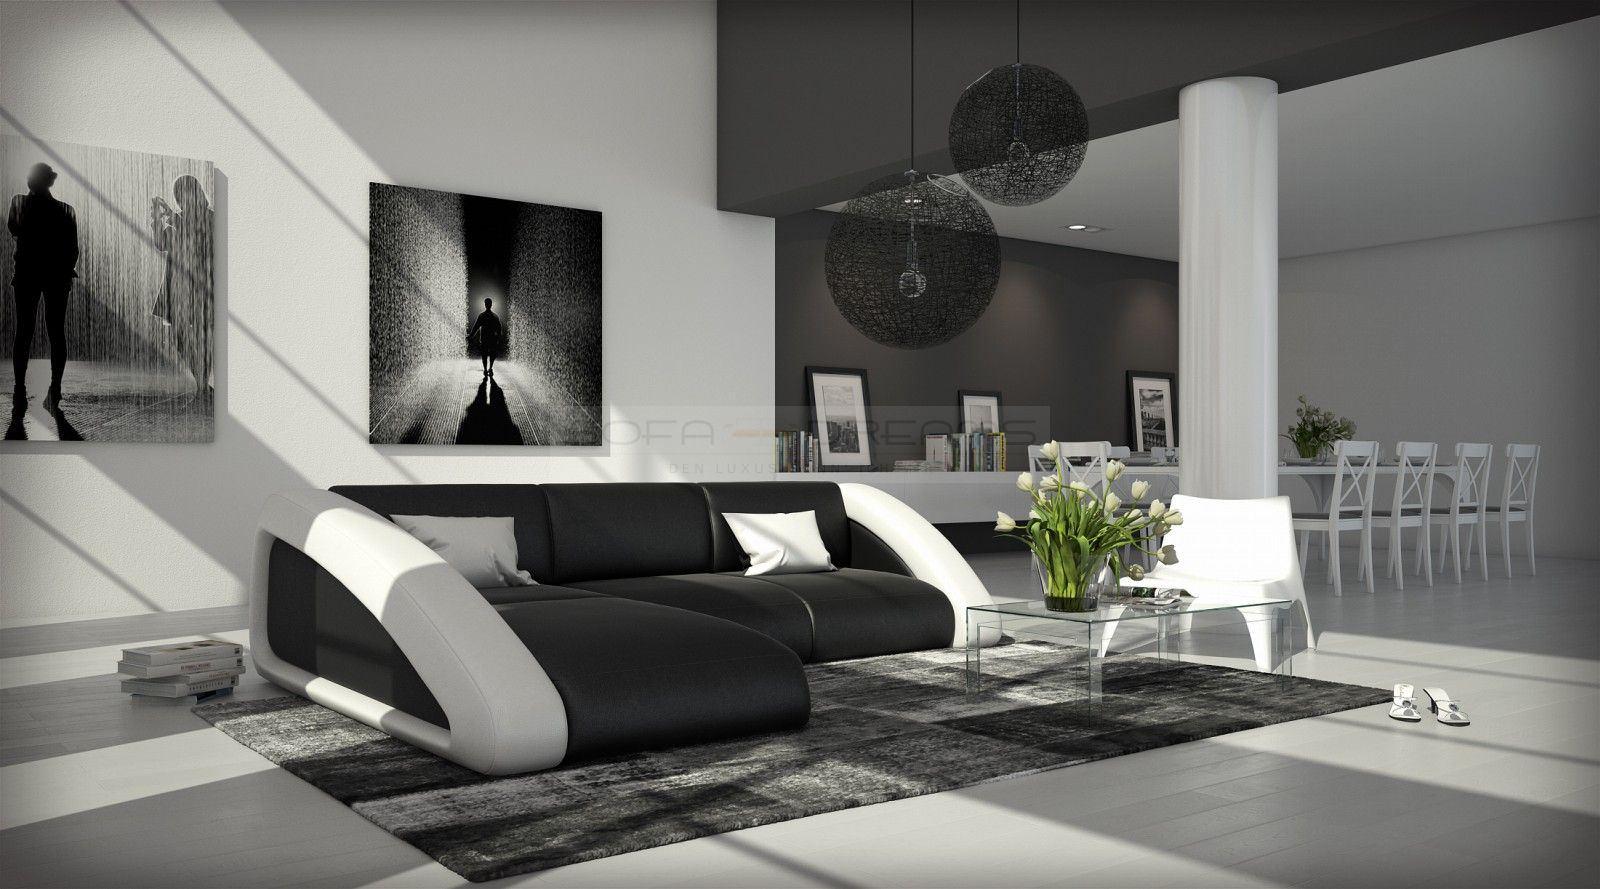 ledersofa nassau l form ecksofa design sofa eckcouch. Black Bedroom Furniture Sets. Home Design Ideas